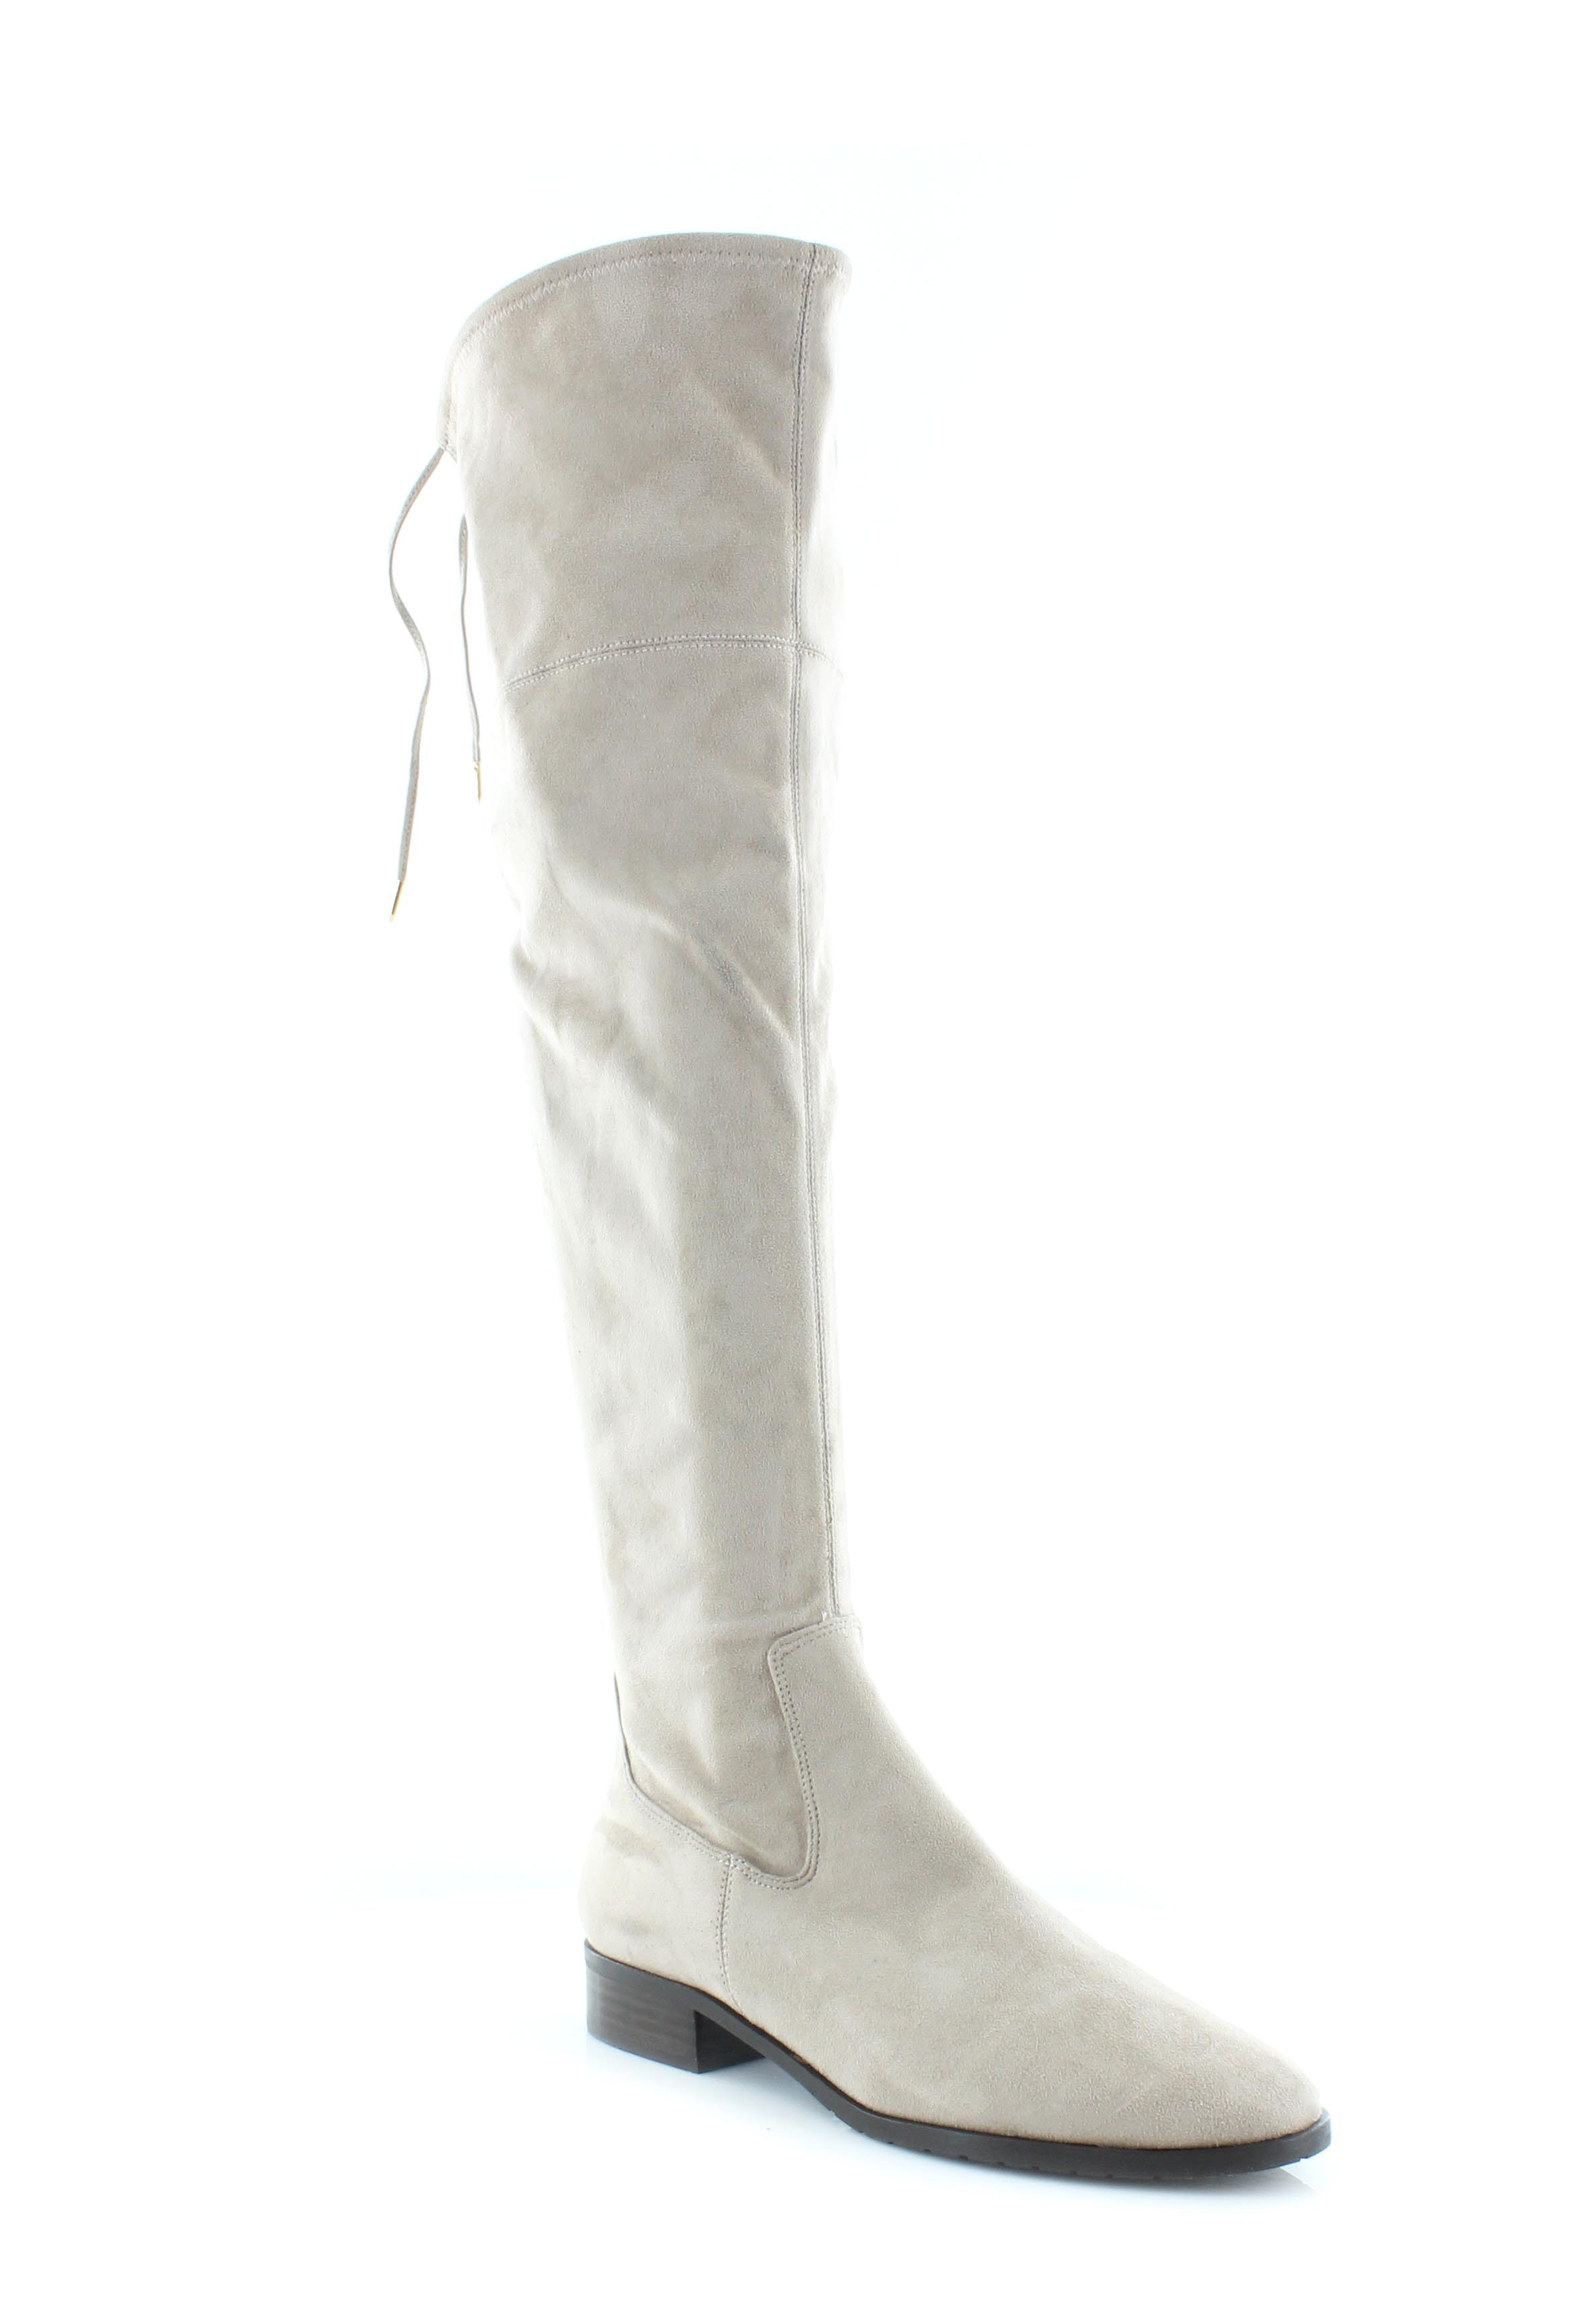 Ivanka Trump Larell Women's Boots Boots Boots Medium Brown 121aa1